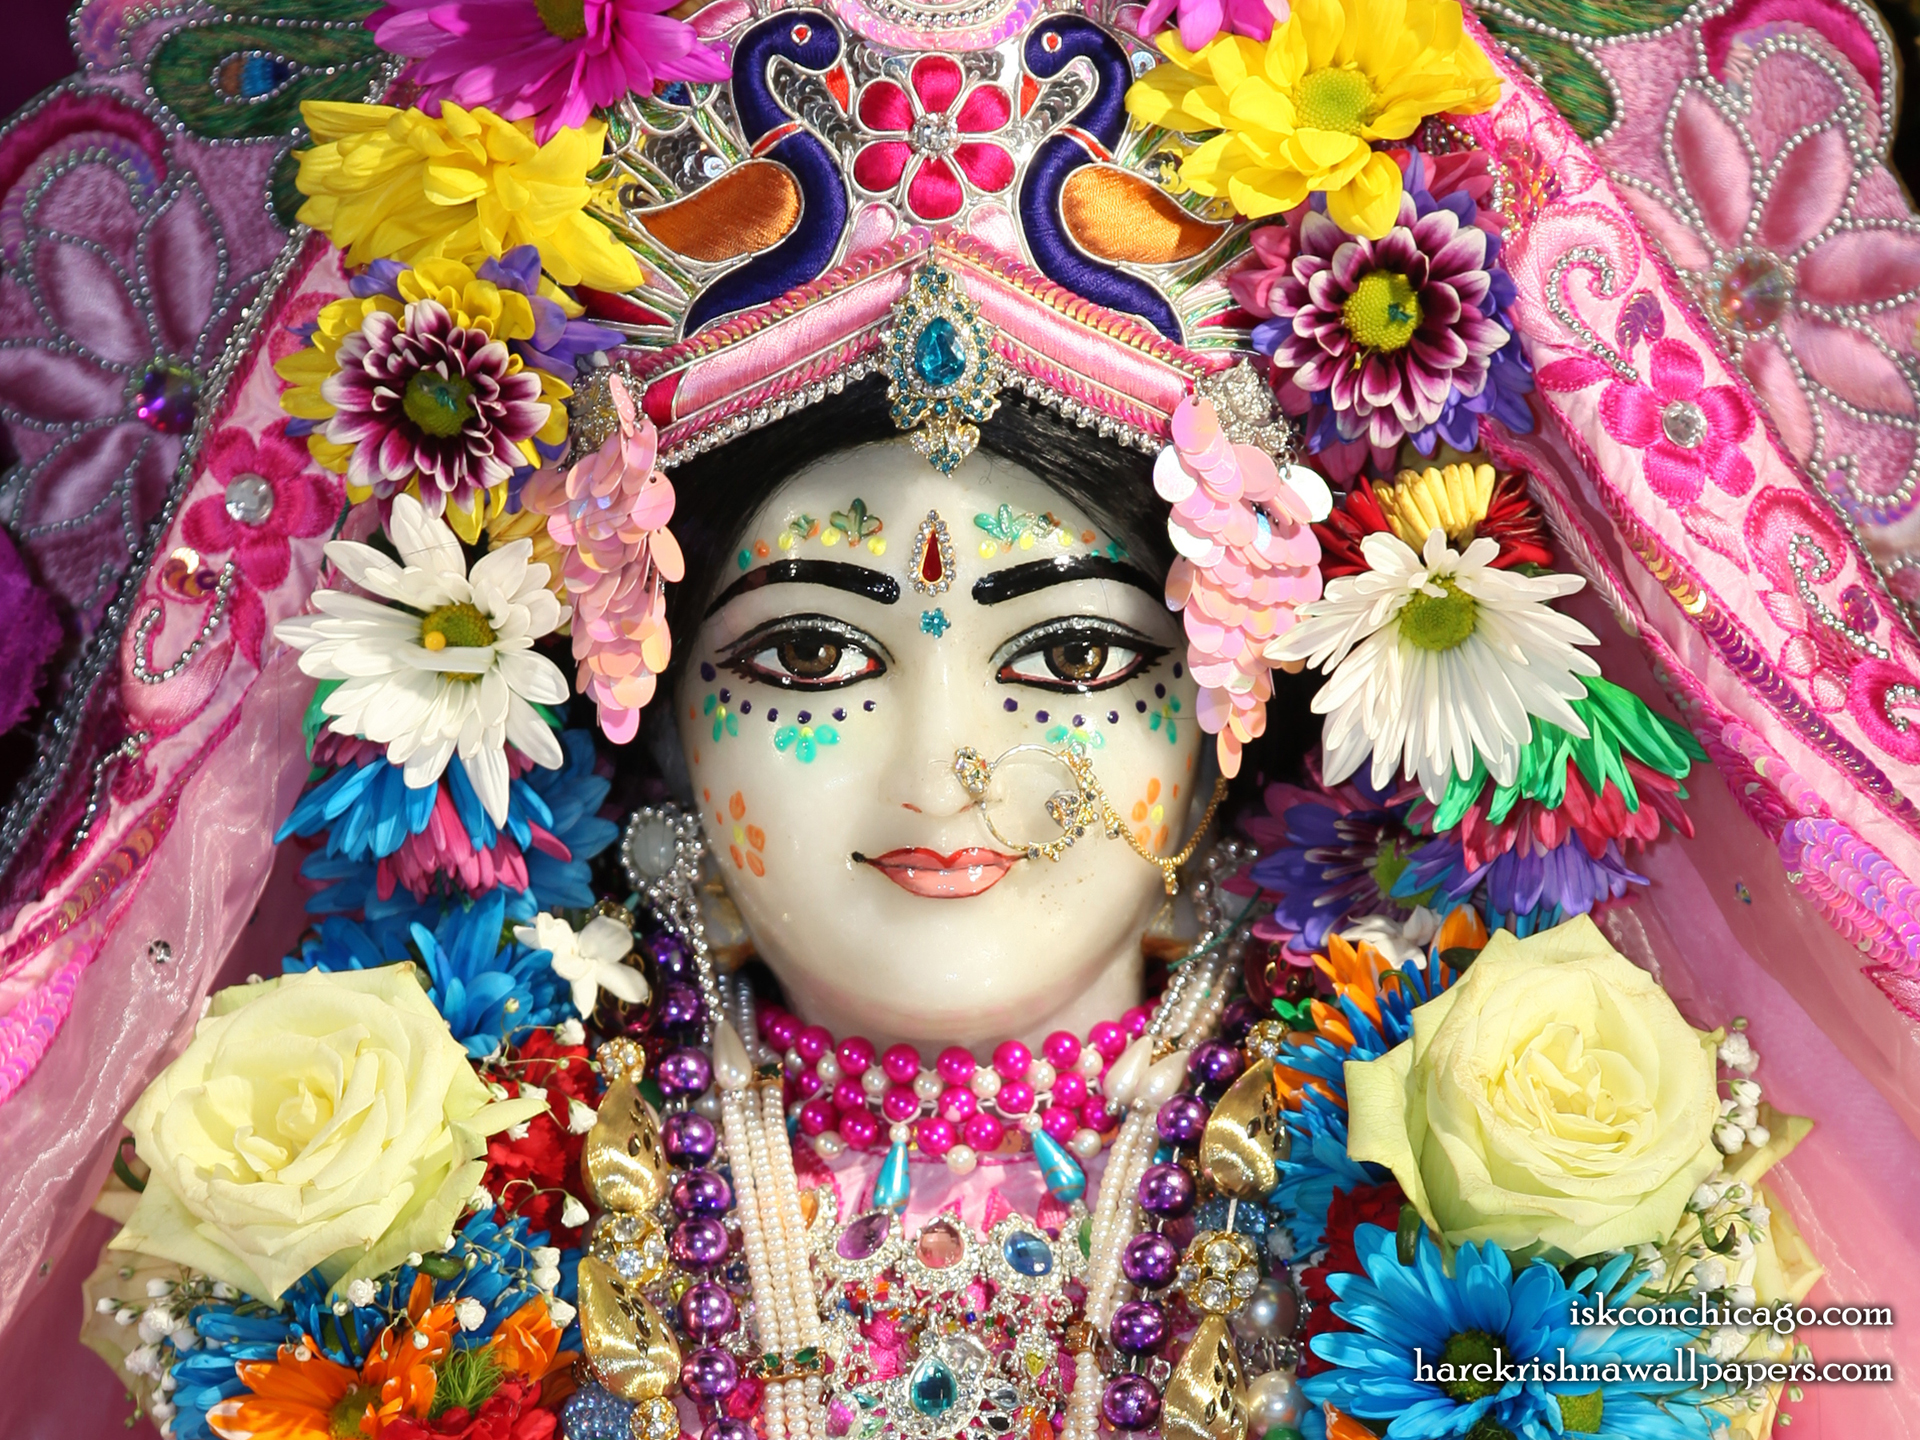 Sri Kishori Close up Wallpaper (003) Size 1920x1440 Download